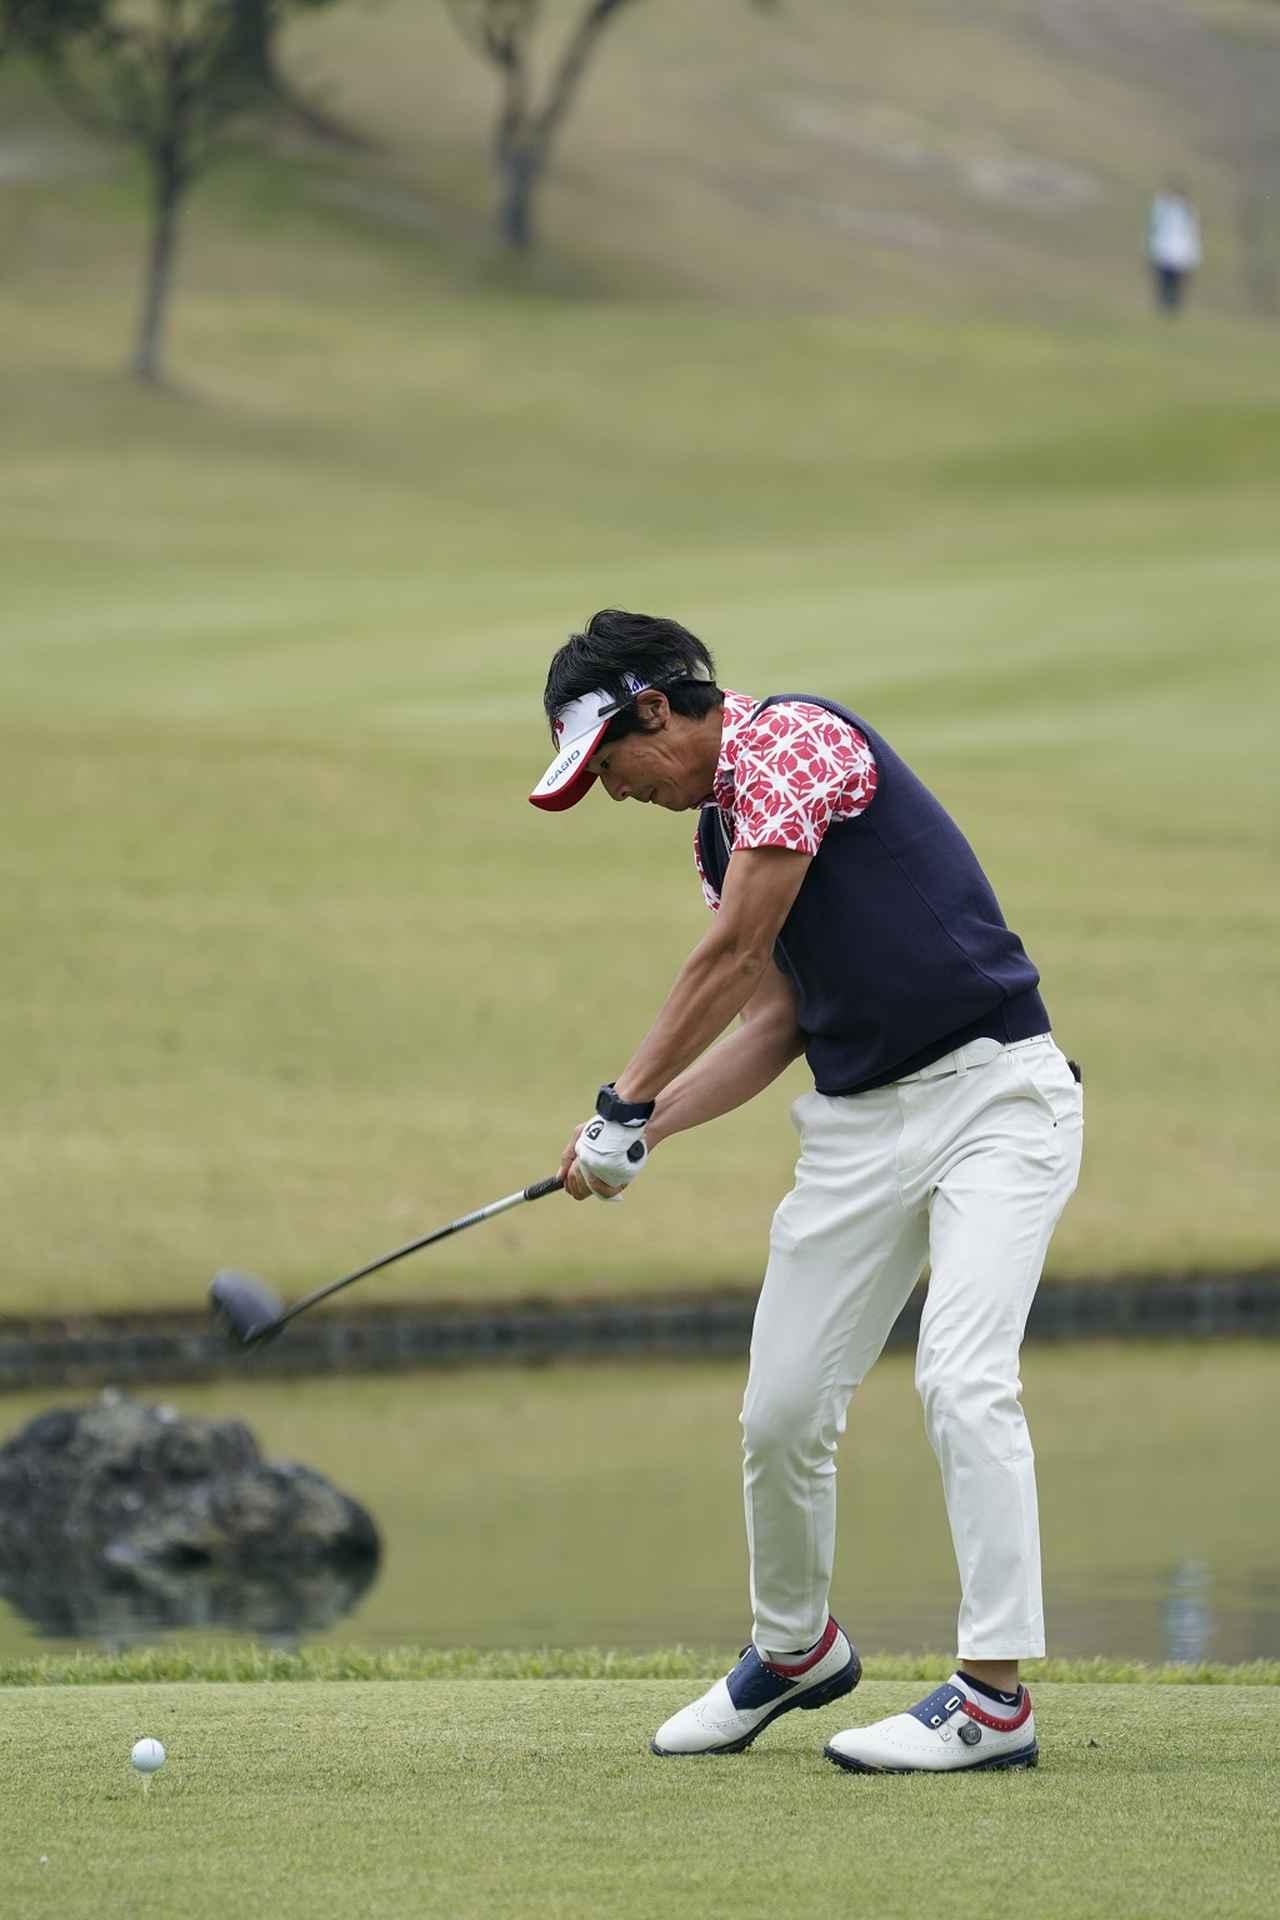 Images : 10番目の画像 - 石川遼ドライバー前方連続写真 - みんなのゴルフダイジェスト